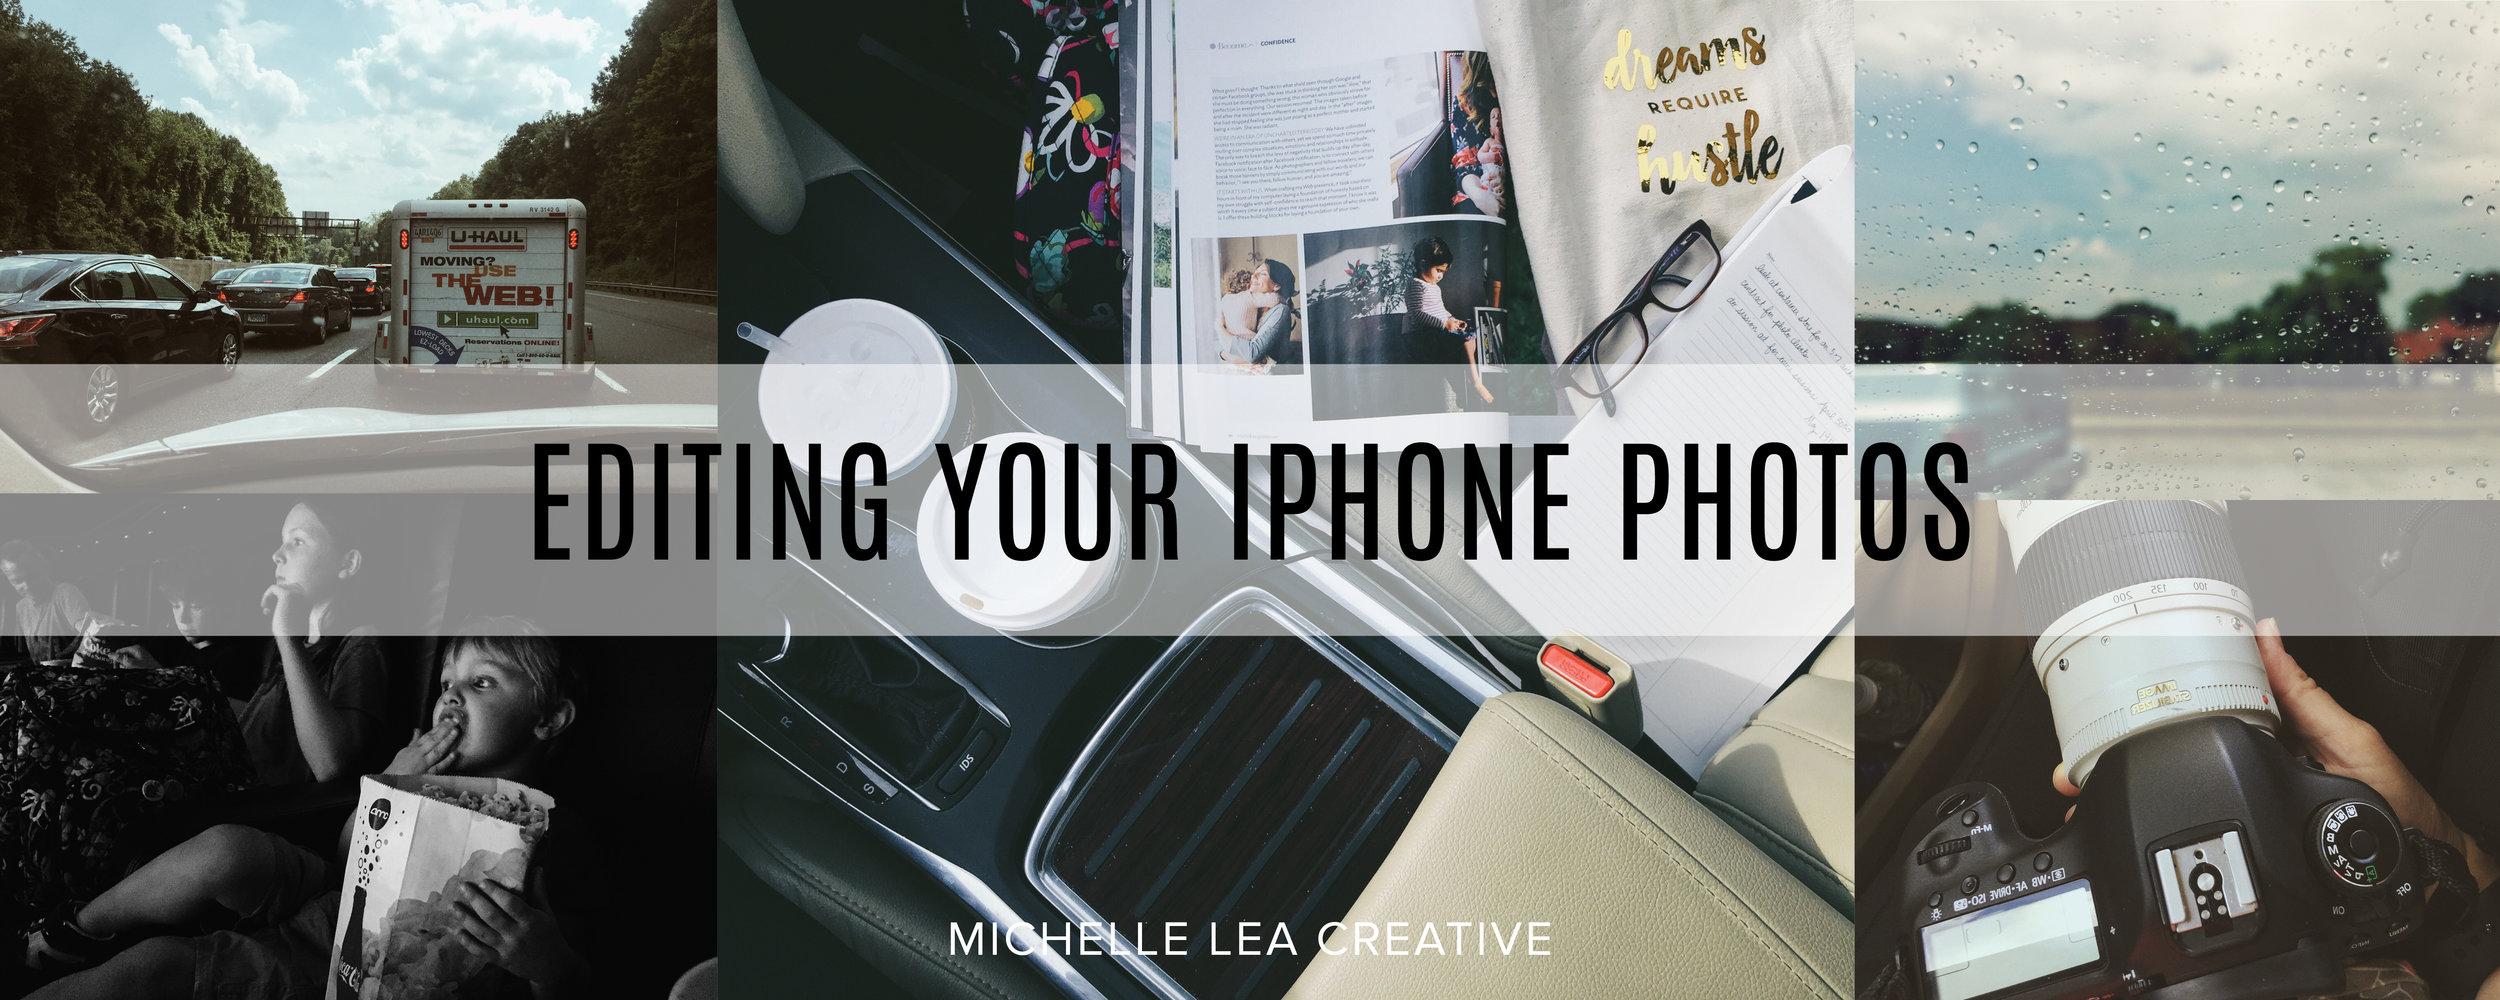 Editing iPhone Photos: Michelle Lea Creative